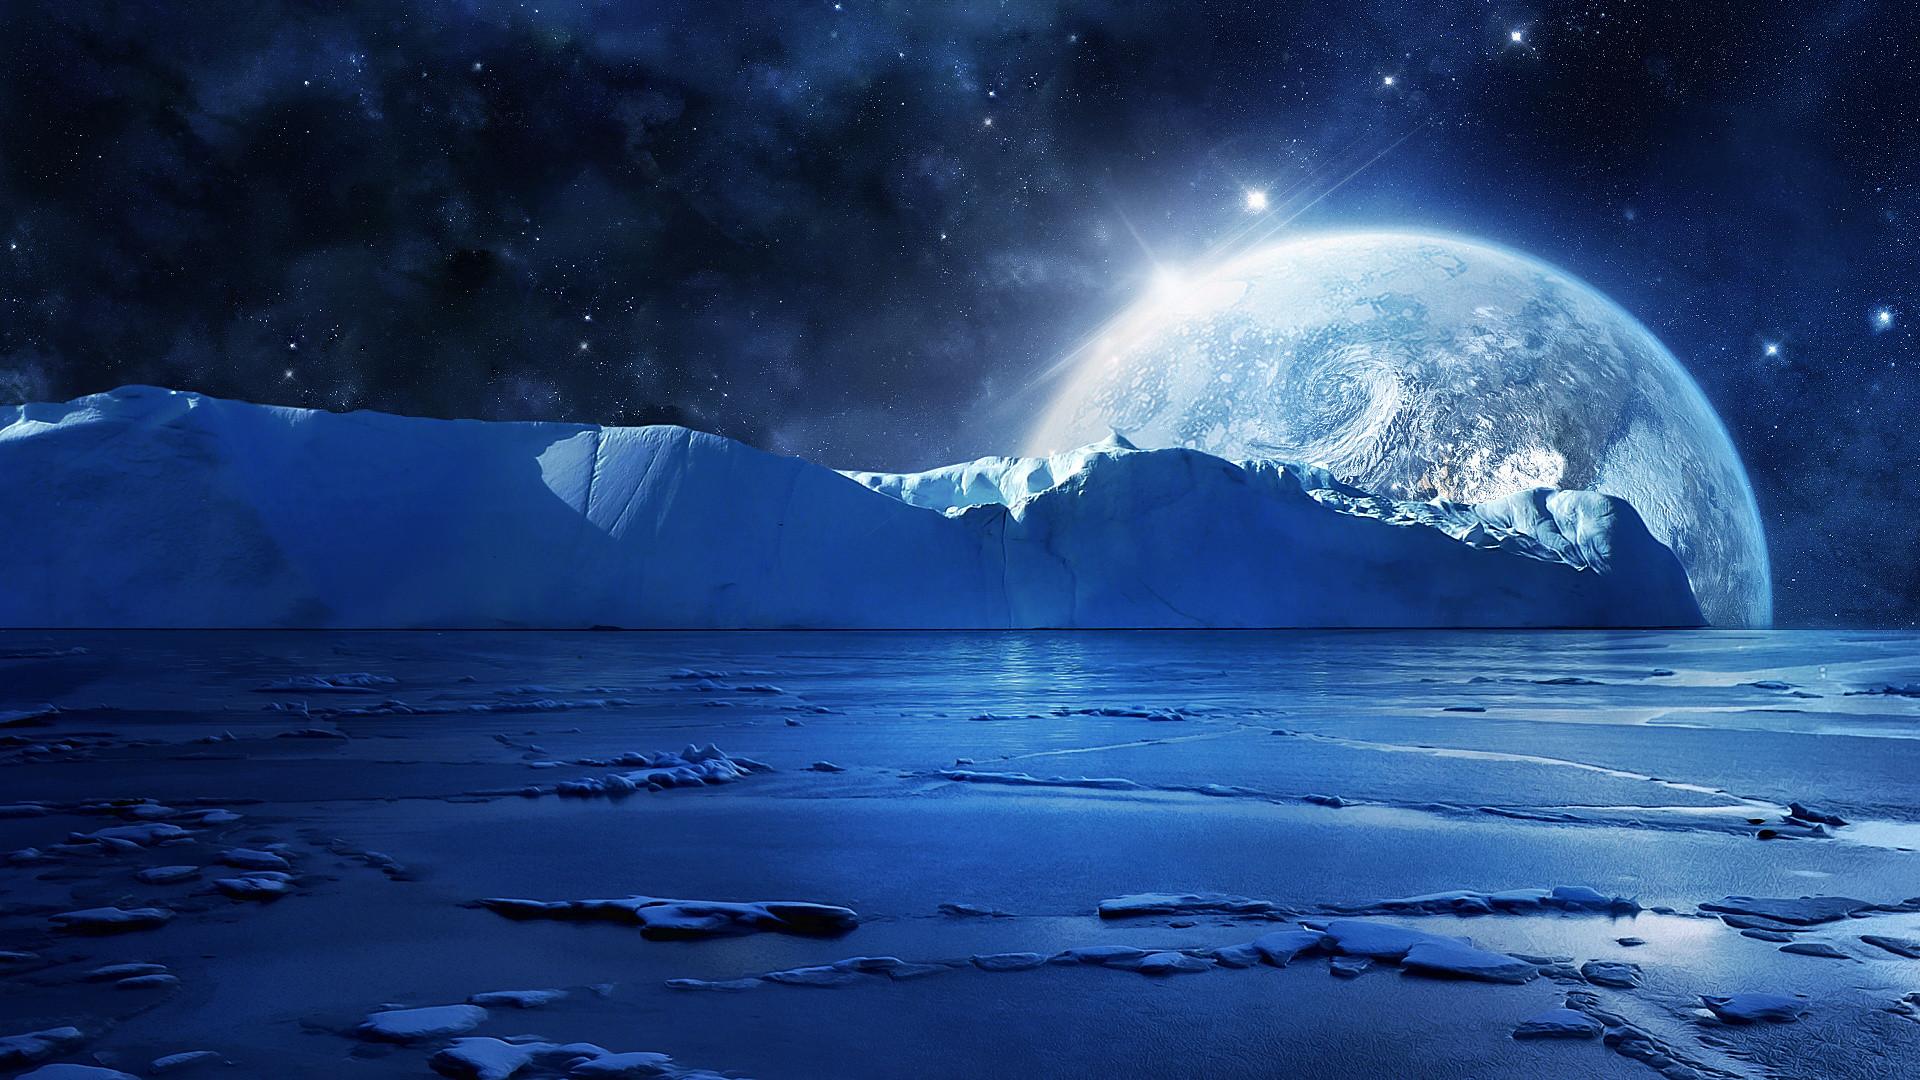 artic winter ocean sea moon sky planets stars space wallpaper